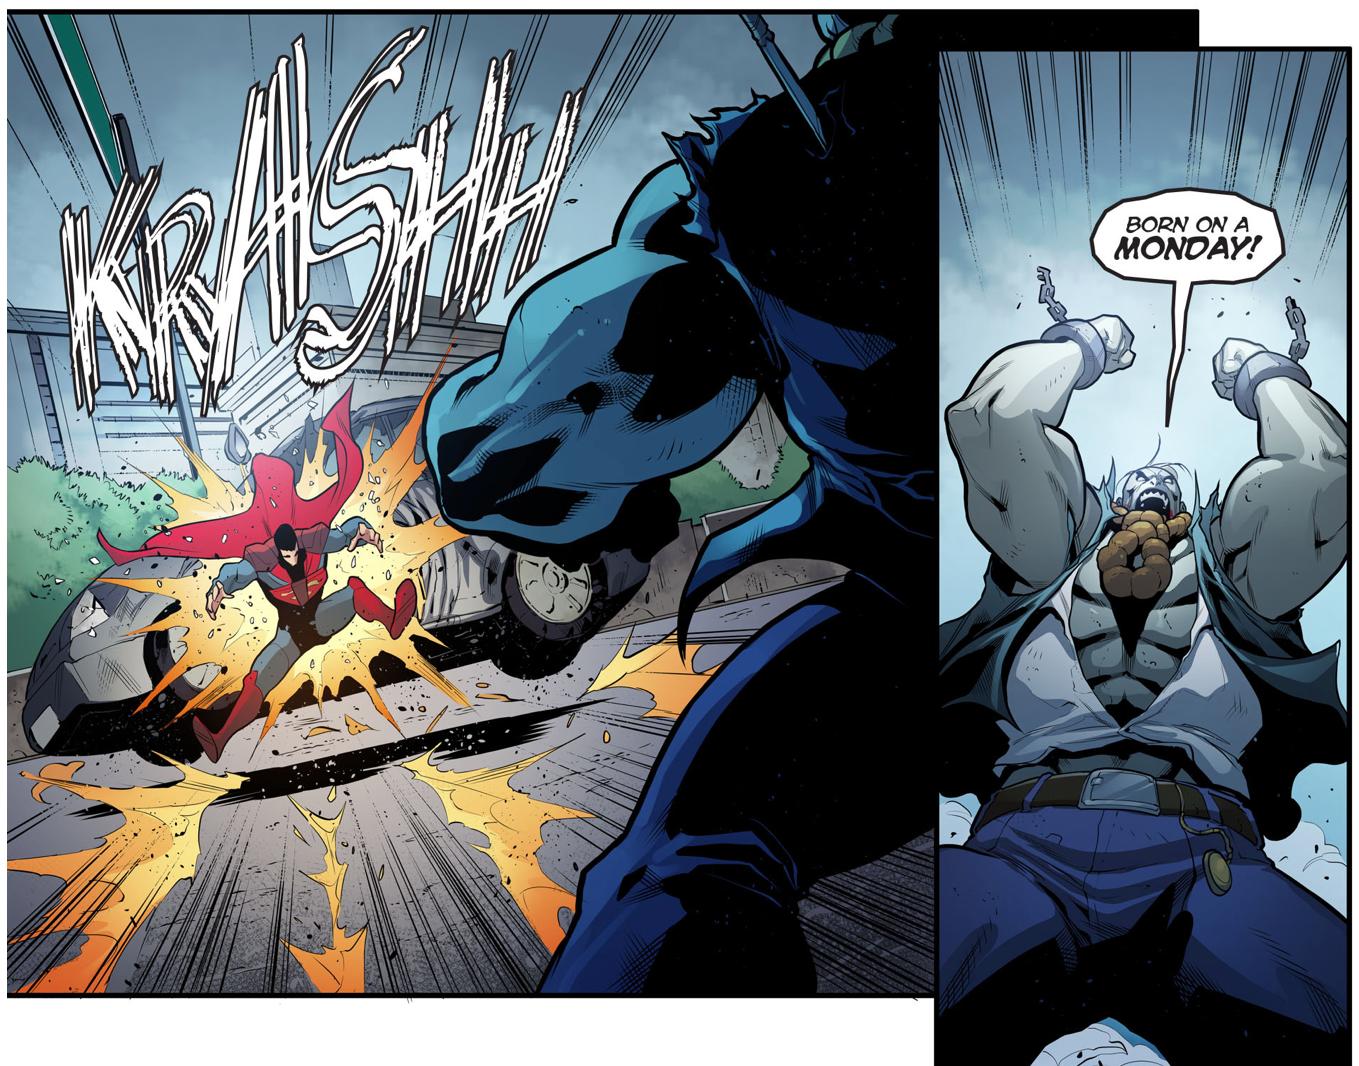 Superman VS Bizarro VS Solomon Grundy (Injustice Gods Among Us)